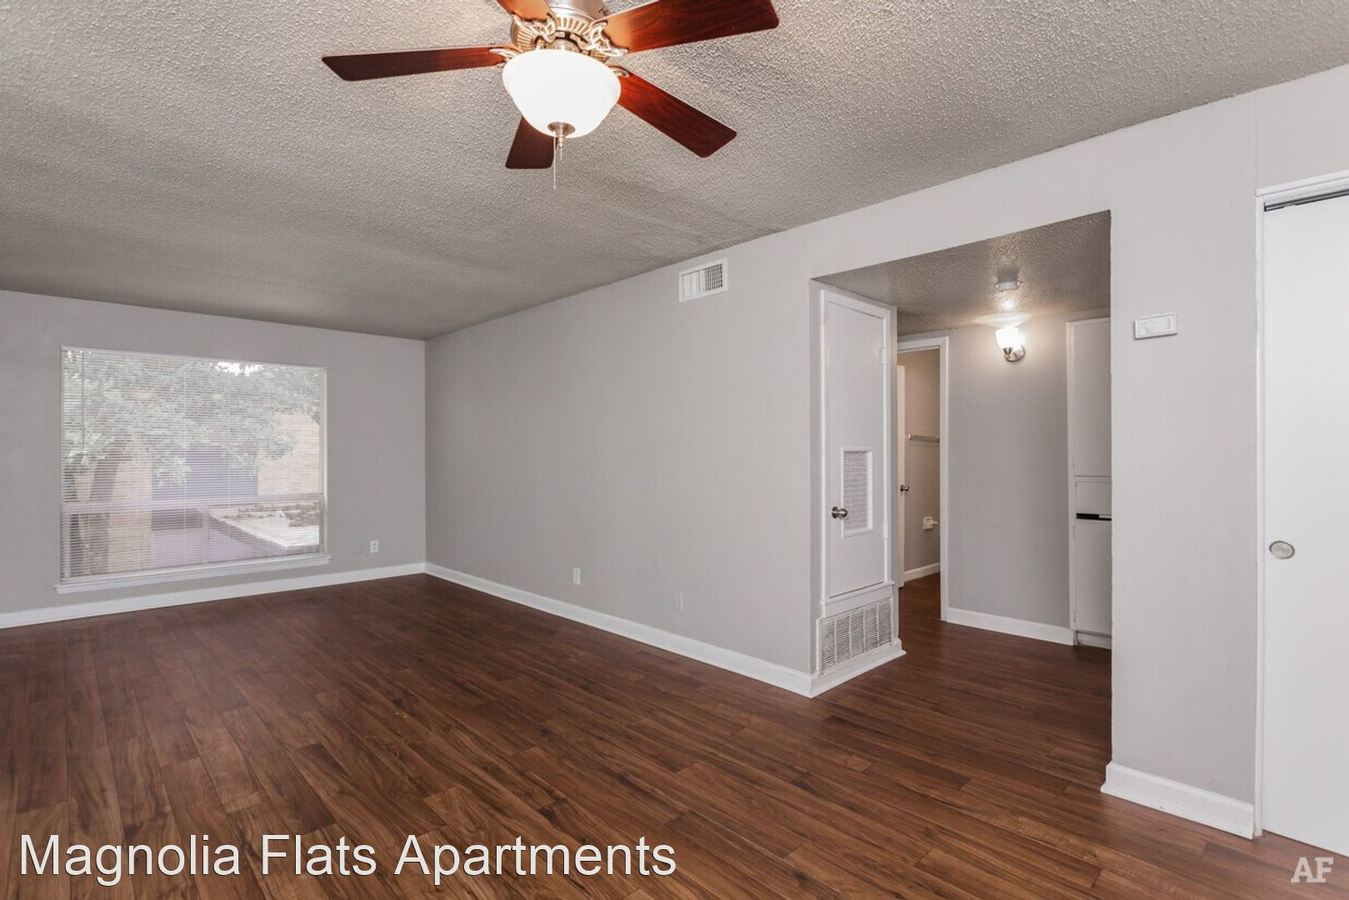 2 Bedrooms 1 Bathroom Apartment for rent at Magnolia Flats Apartments in San Antonio, TX